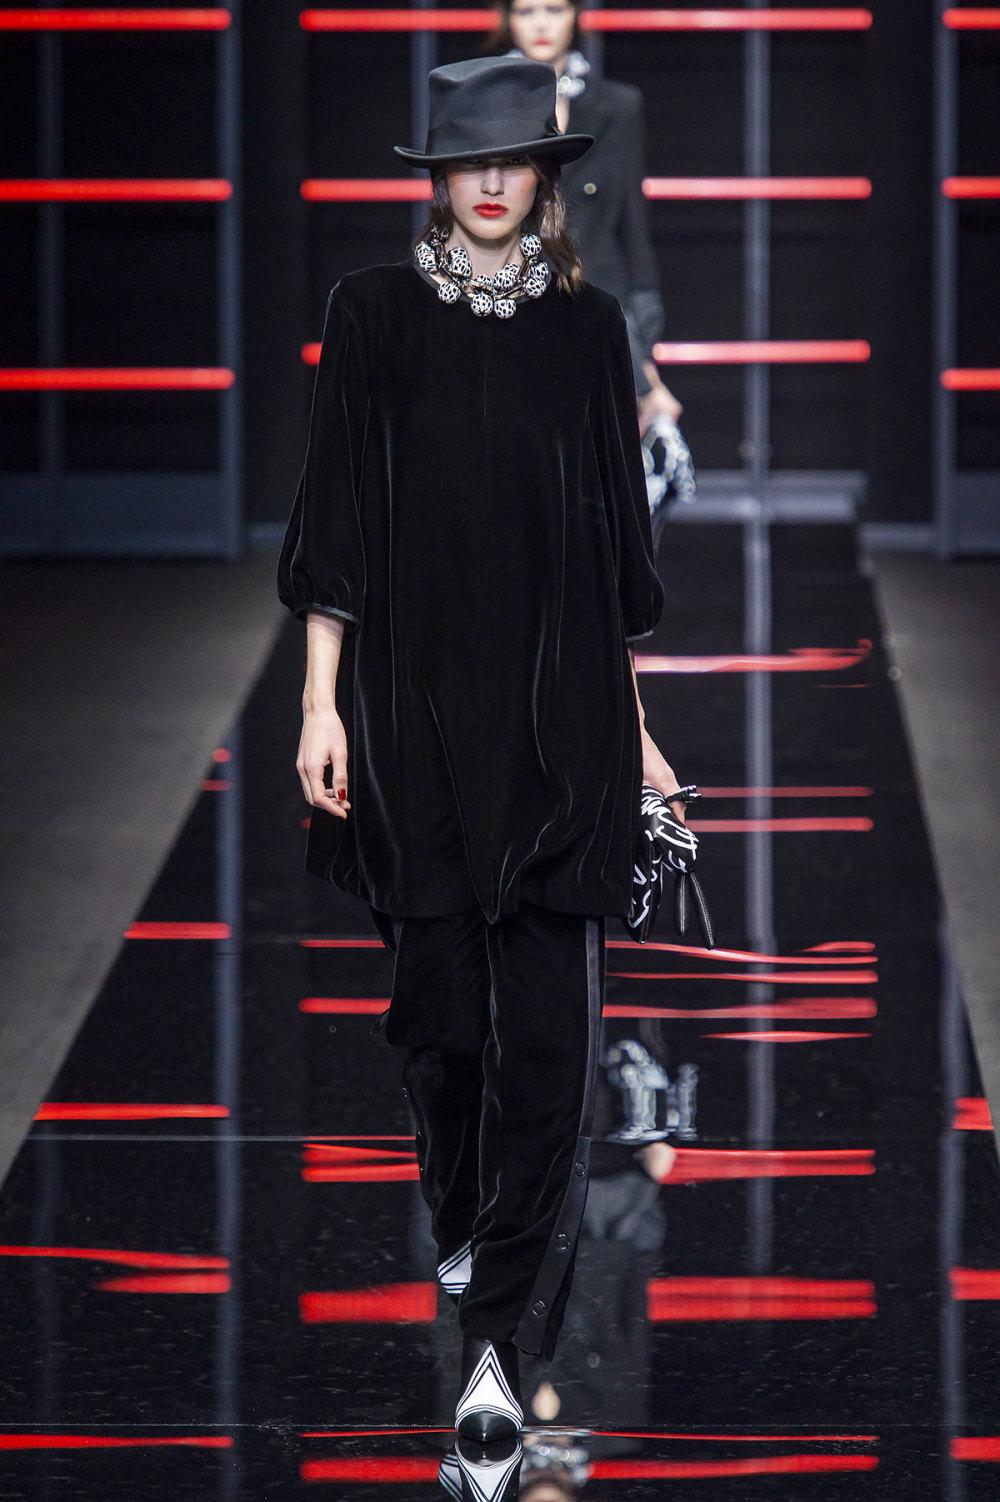 Emporio Armani时装系列畅的裤子带有柔滑裙子的鸡尾酒礼服-26.jpg